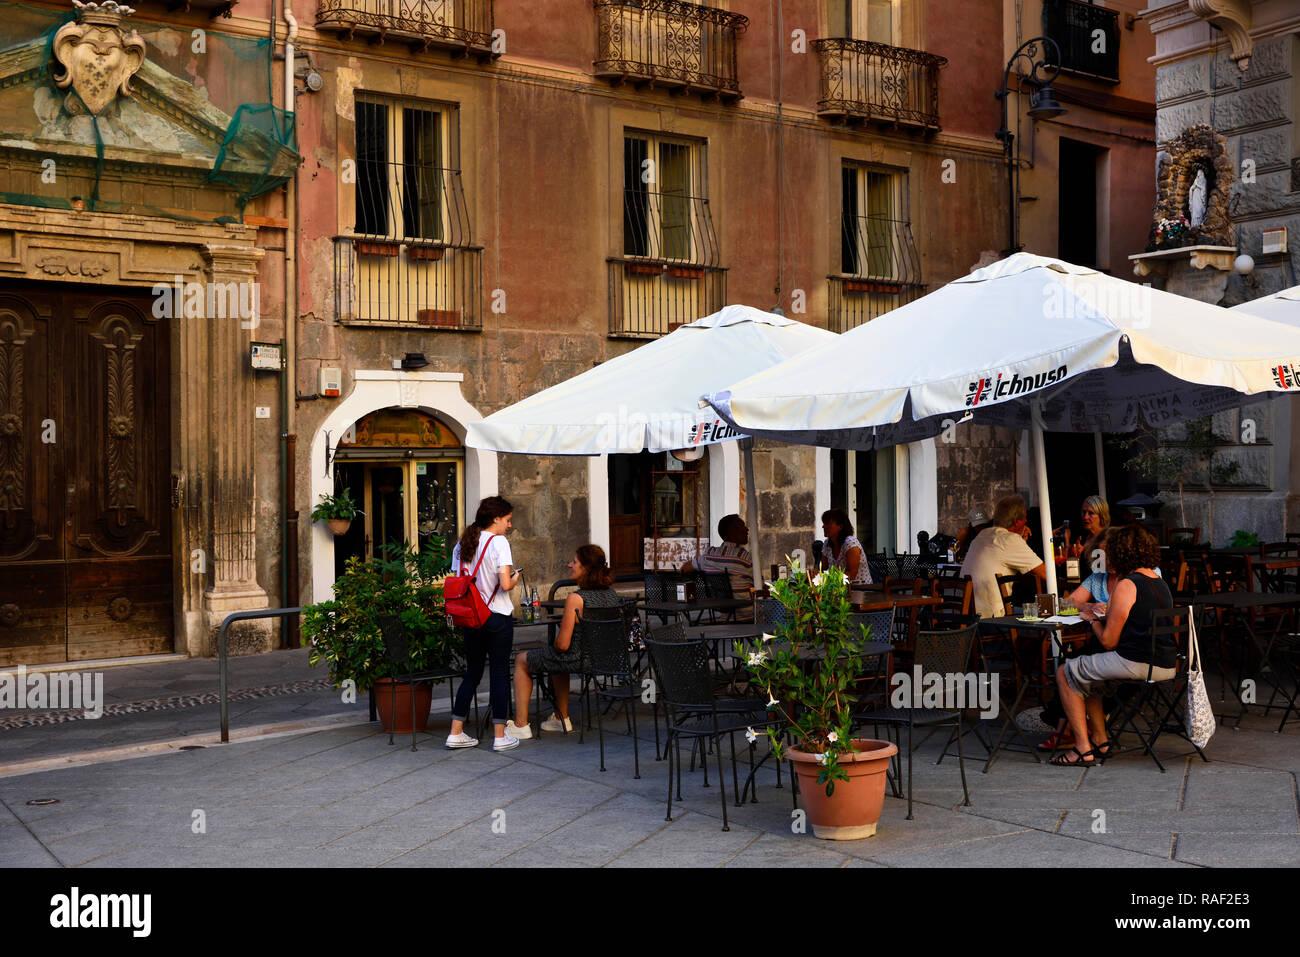 Old town Cagliari Sardinia Italy - Stock Image